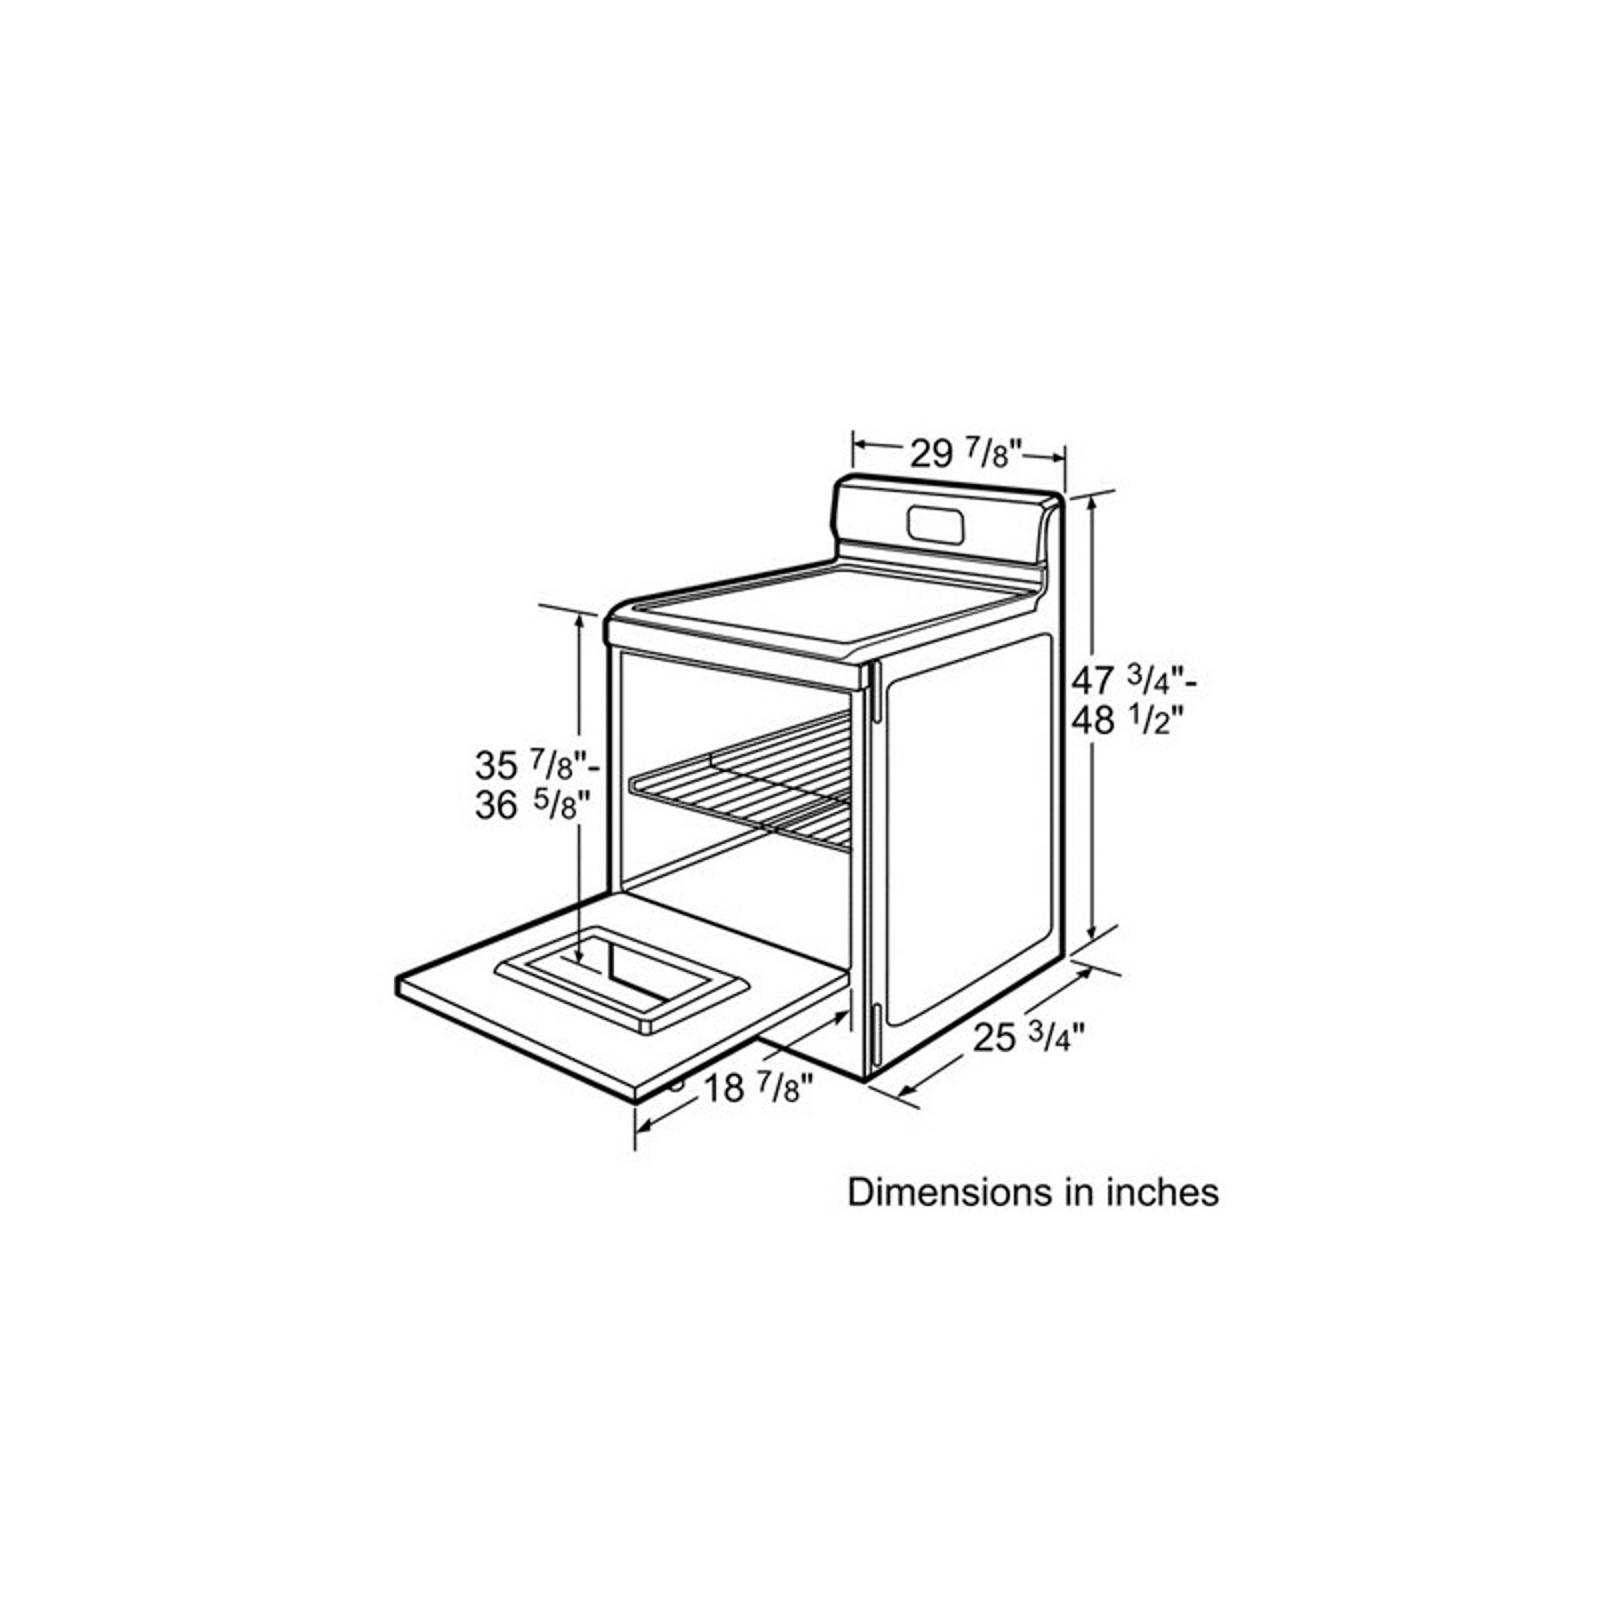 small resolution of bosch 5 4 cu ft freestanding electric range sears craftsman riding mower wiring diagram bosch 5